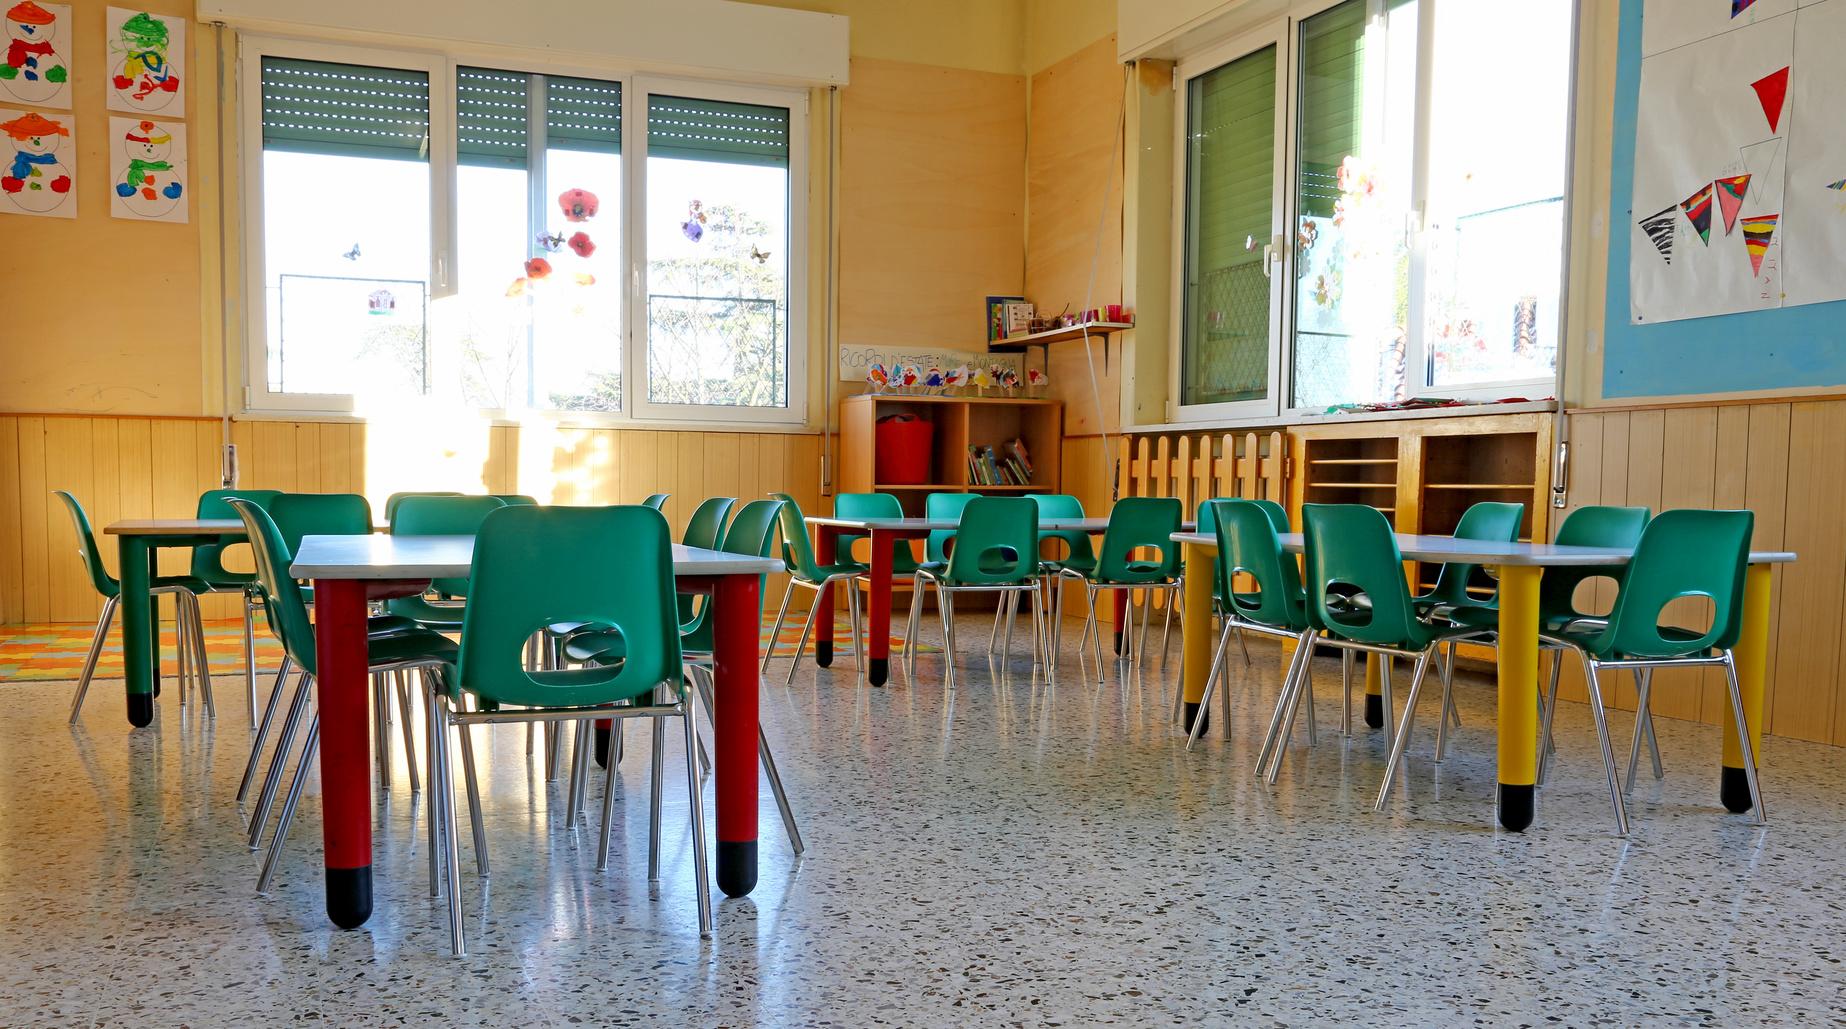 Region narrows pupil attainment gap